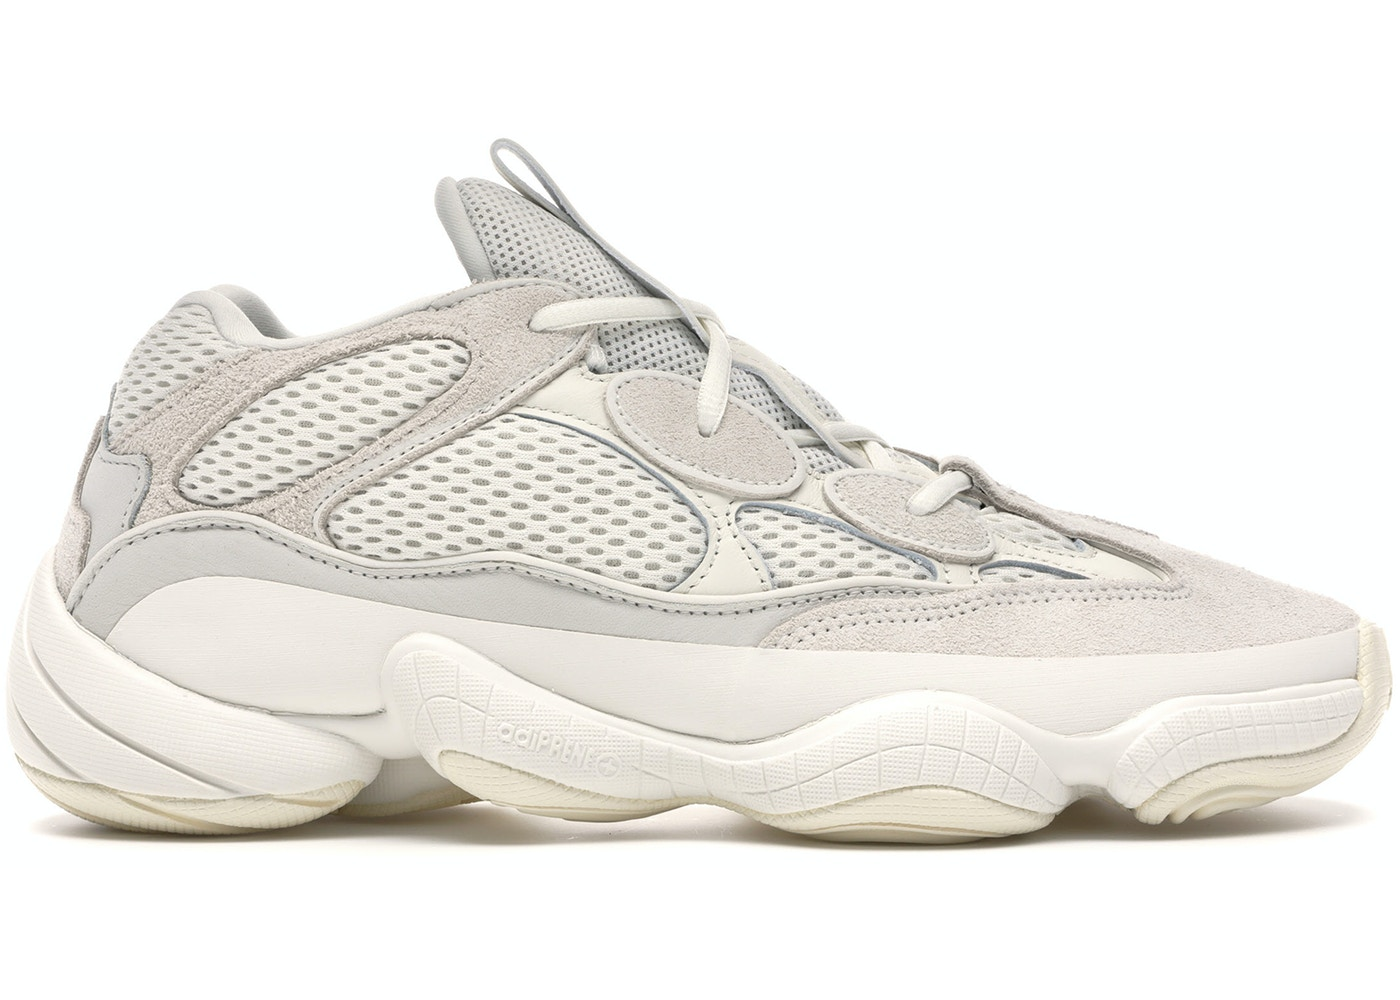 cheaper 441da 82c27 adidas Yeezy 500 Bone White